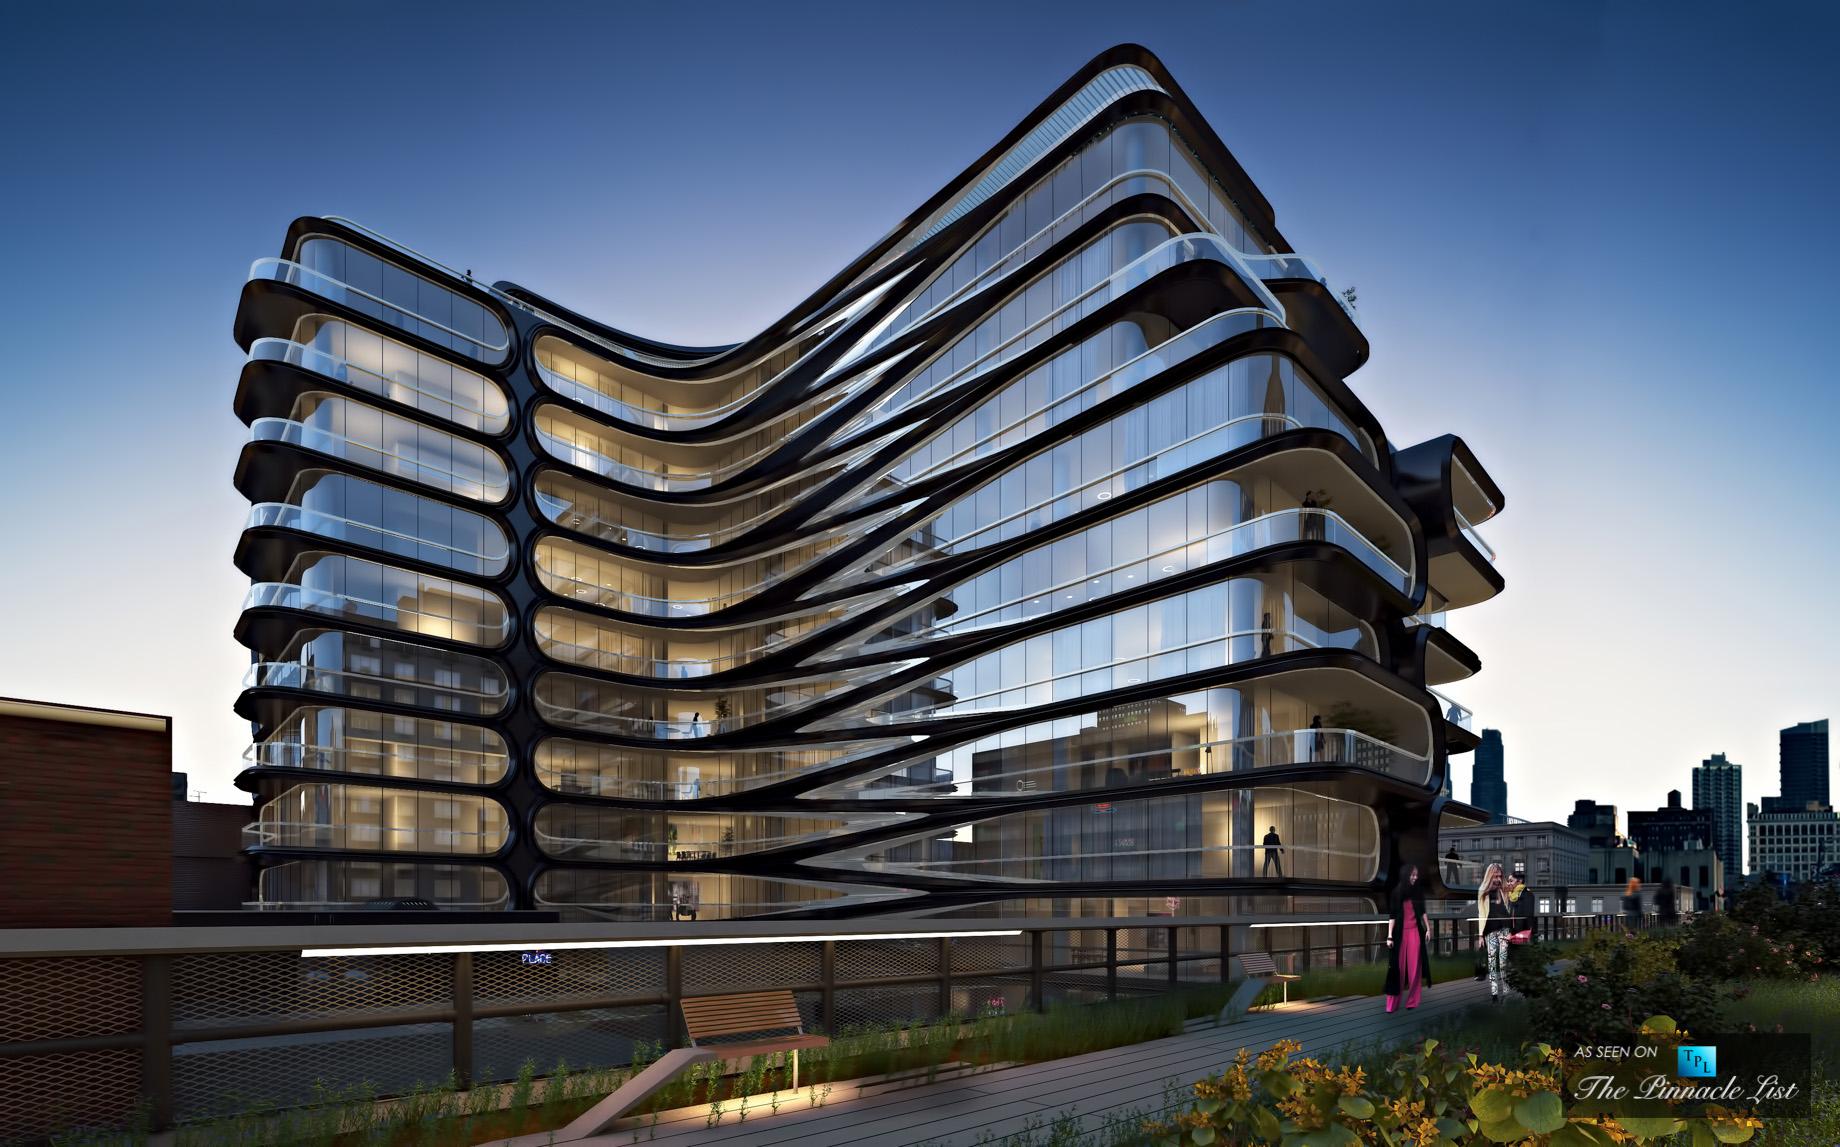 520 West 28th Street, New York - Zaha Hadid Architects